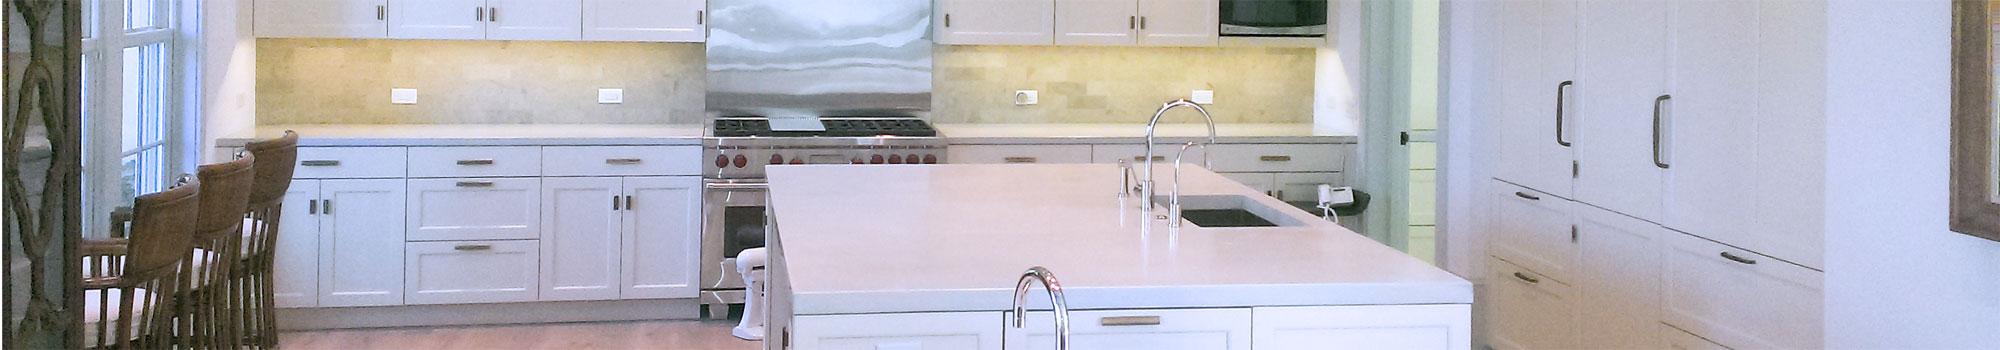 Concrete Countertops for the Kitchen